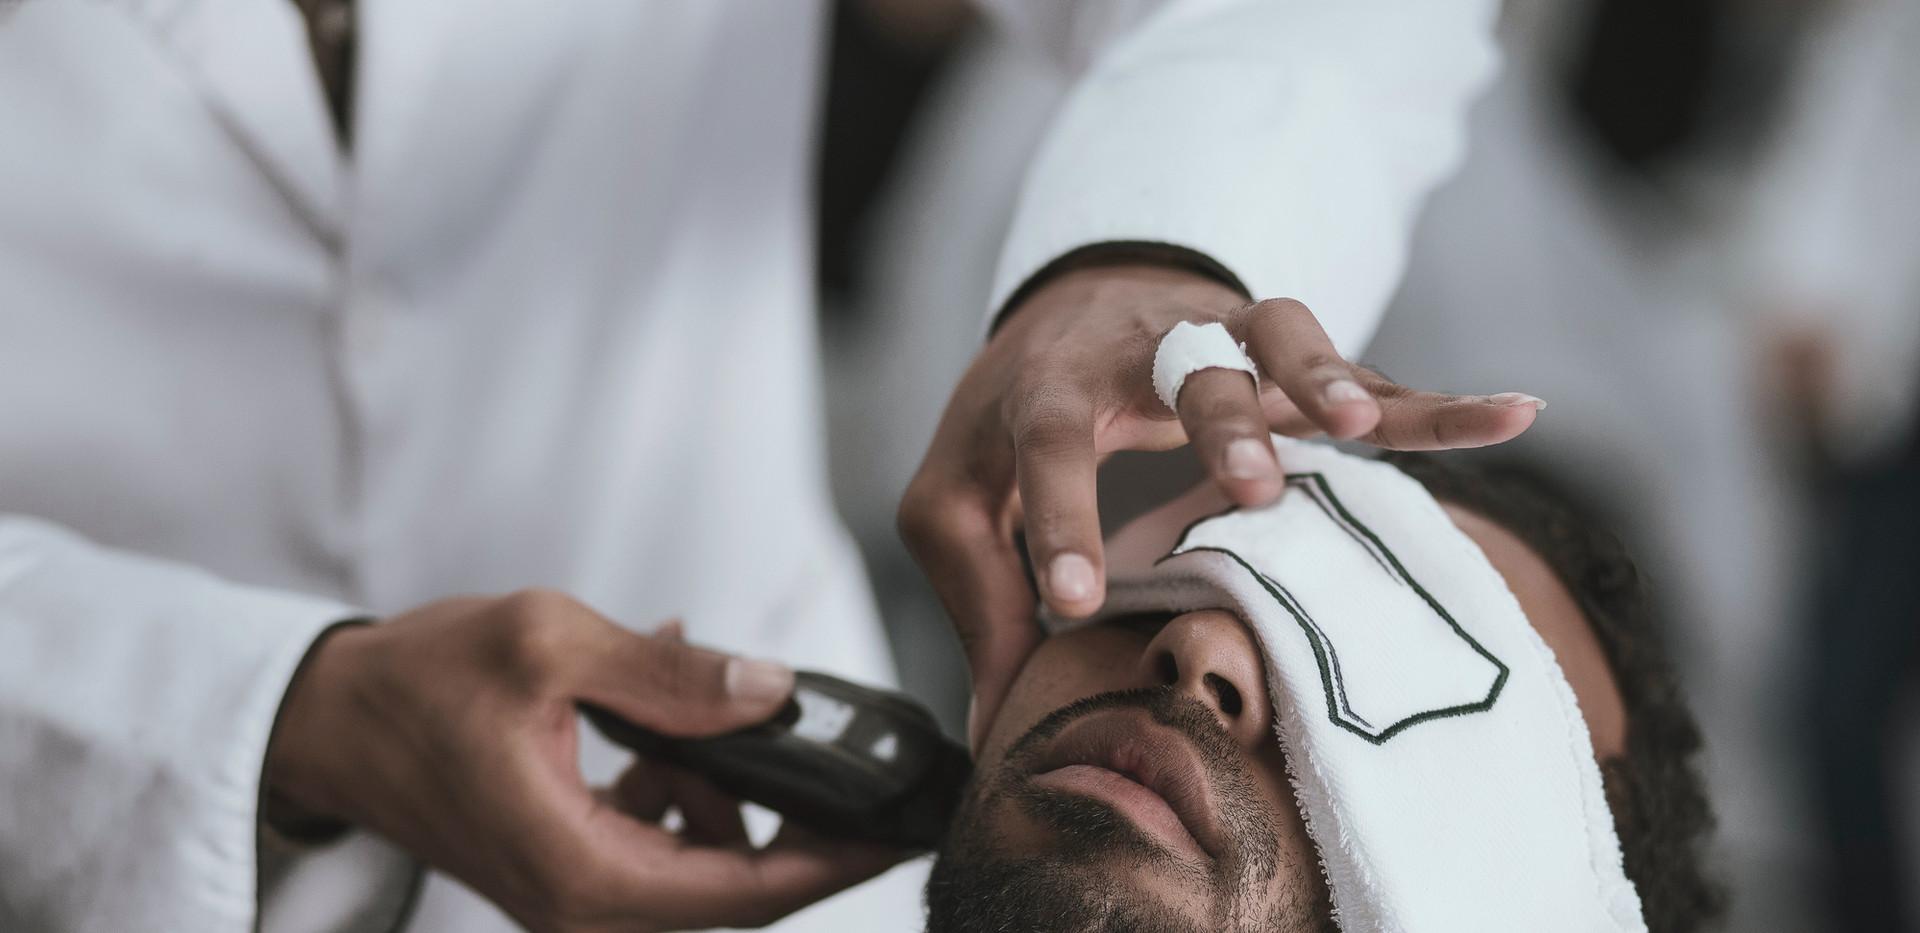 Barber Grooming Top Style Barber Hounslow number one Barber shop